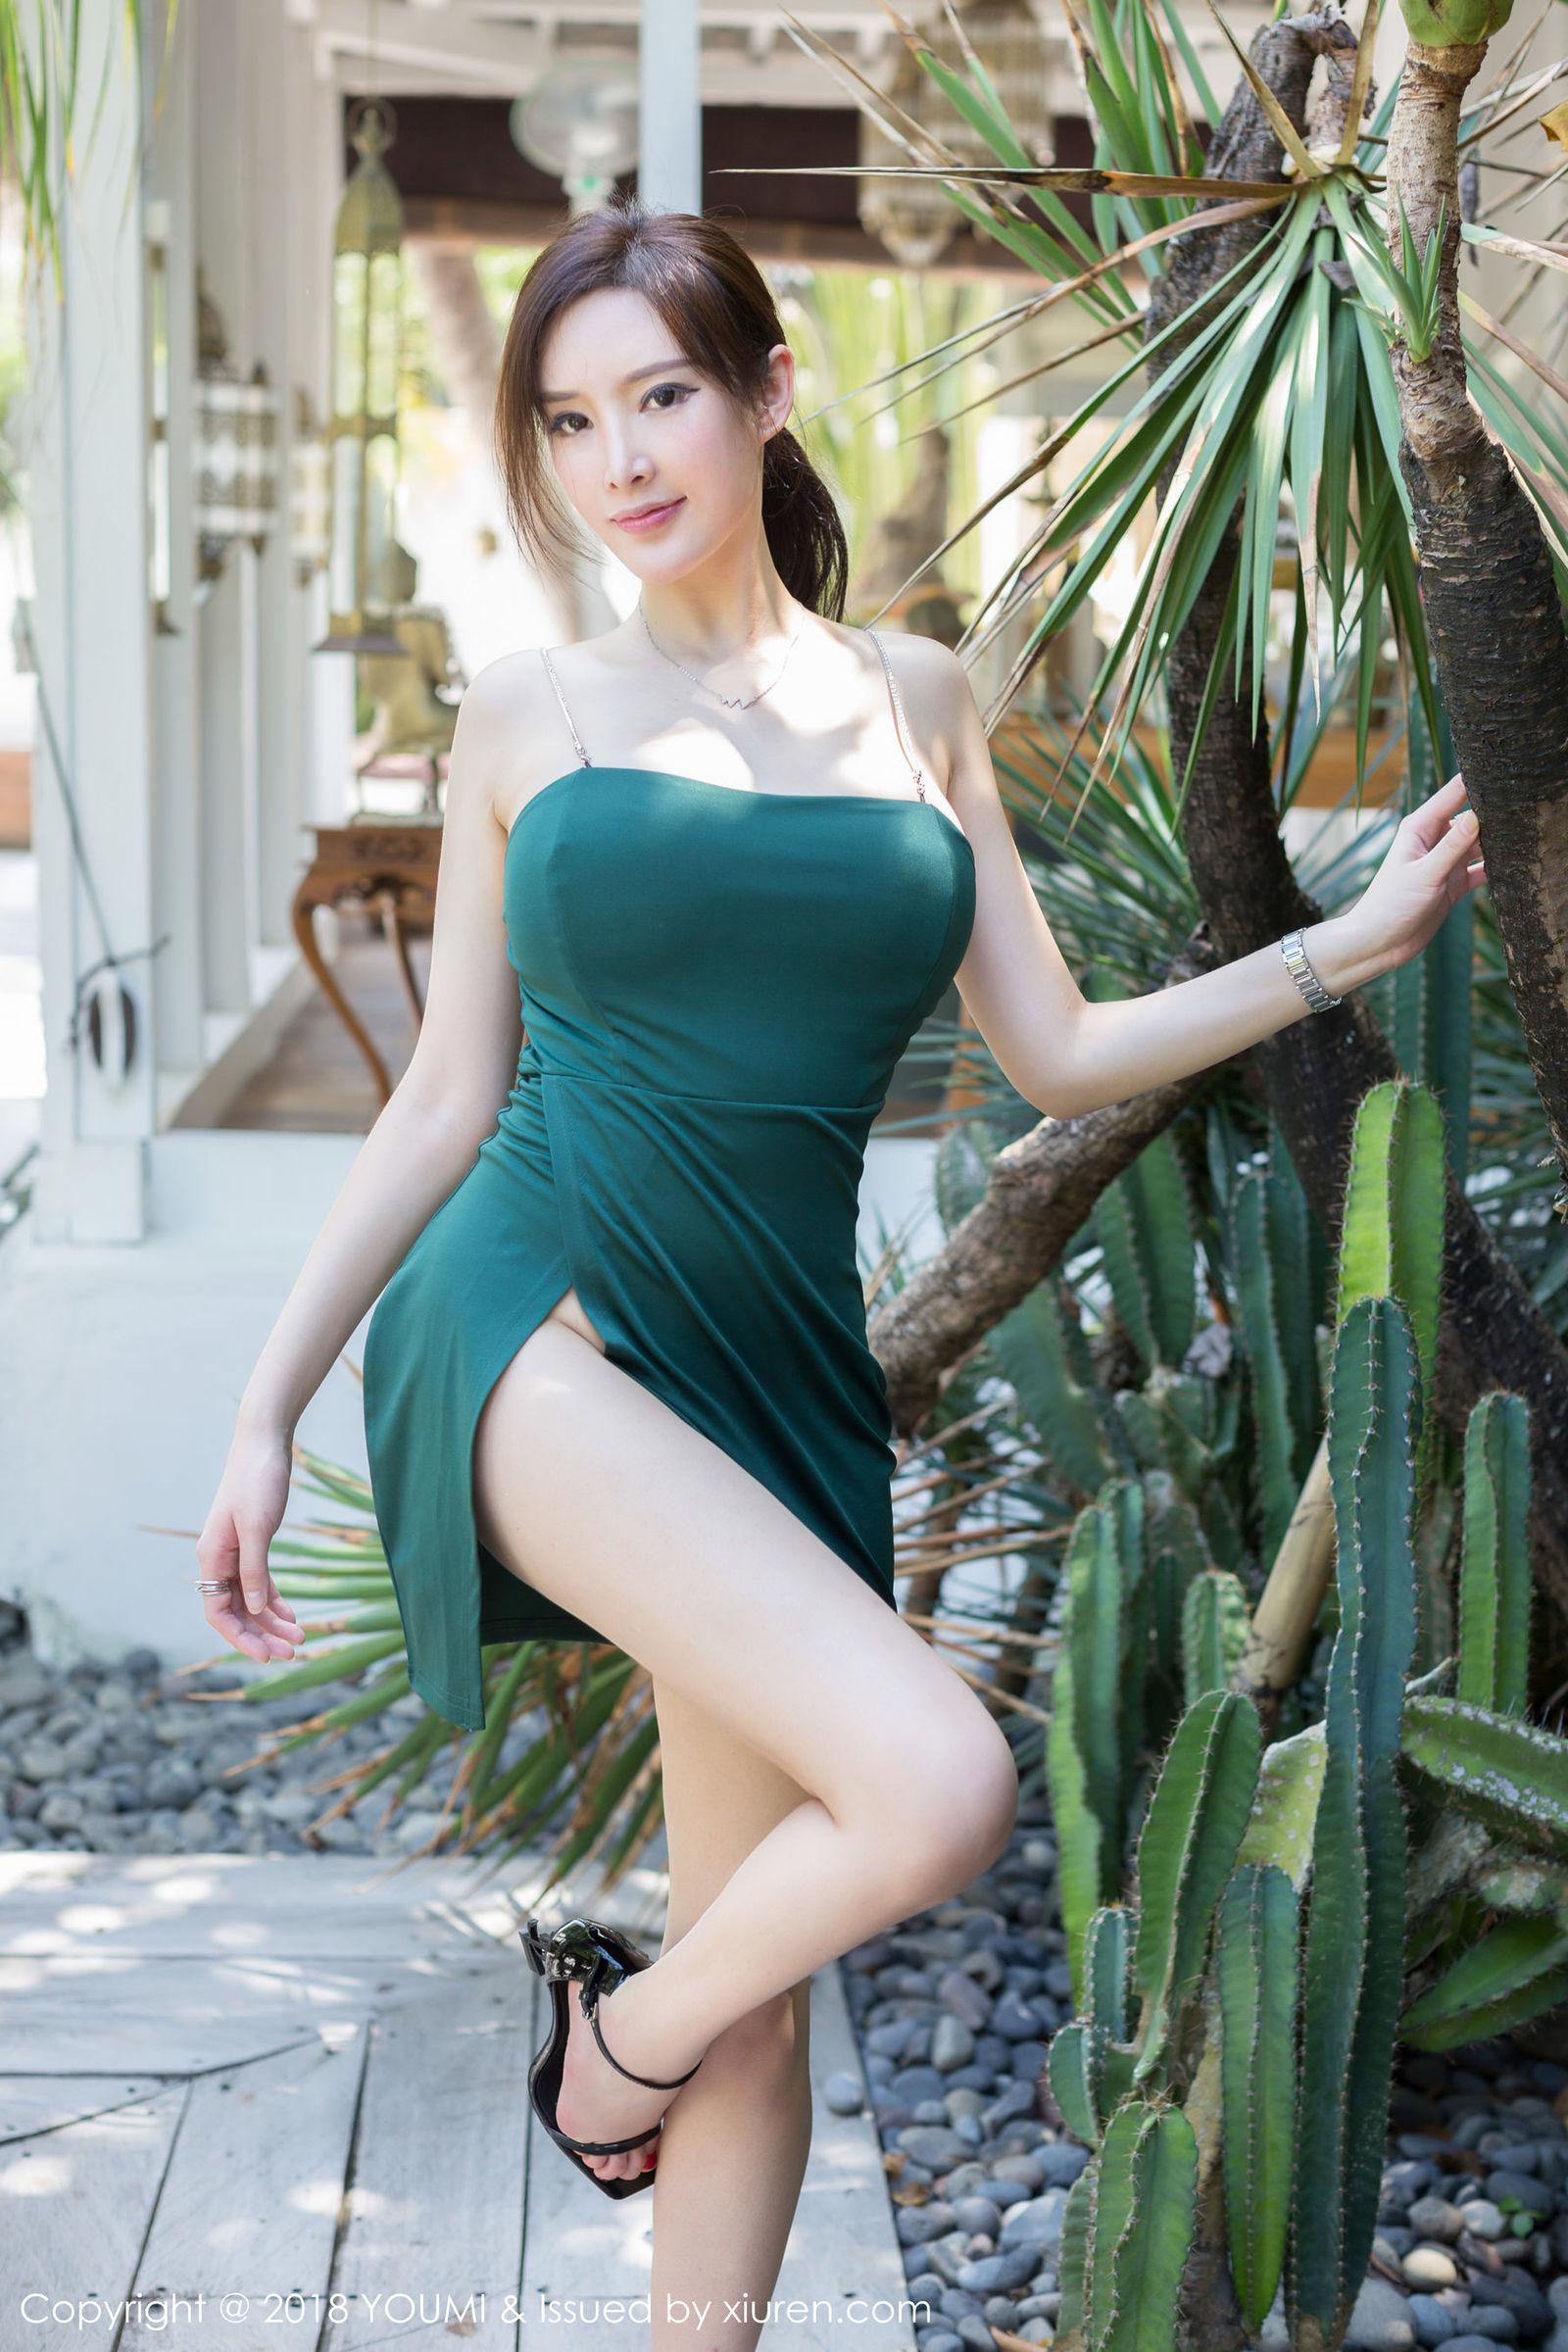 [YouMi尤蜜荟] Vol.188 女神@奶瓶土肥圆巴厘岛旅拍写真